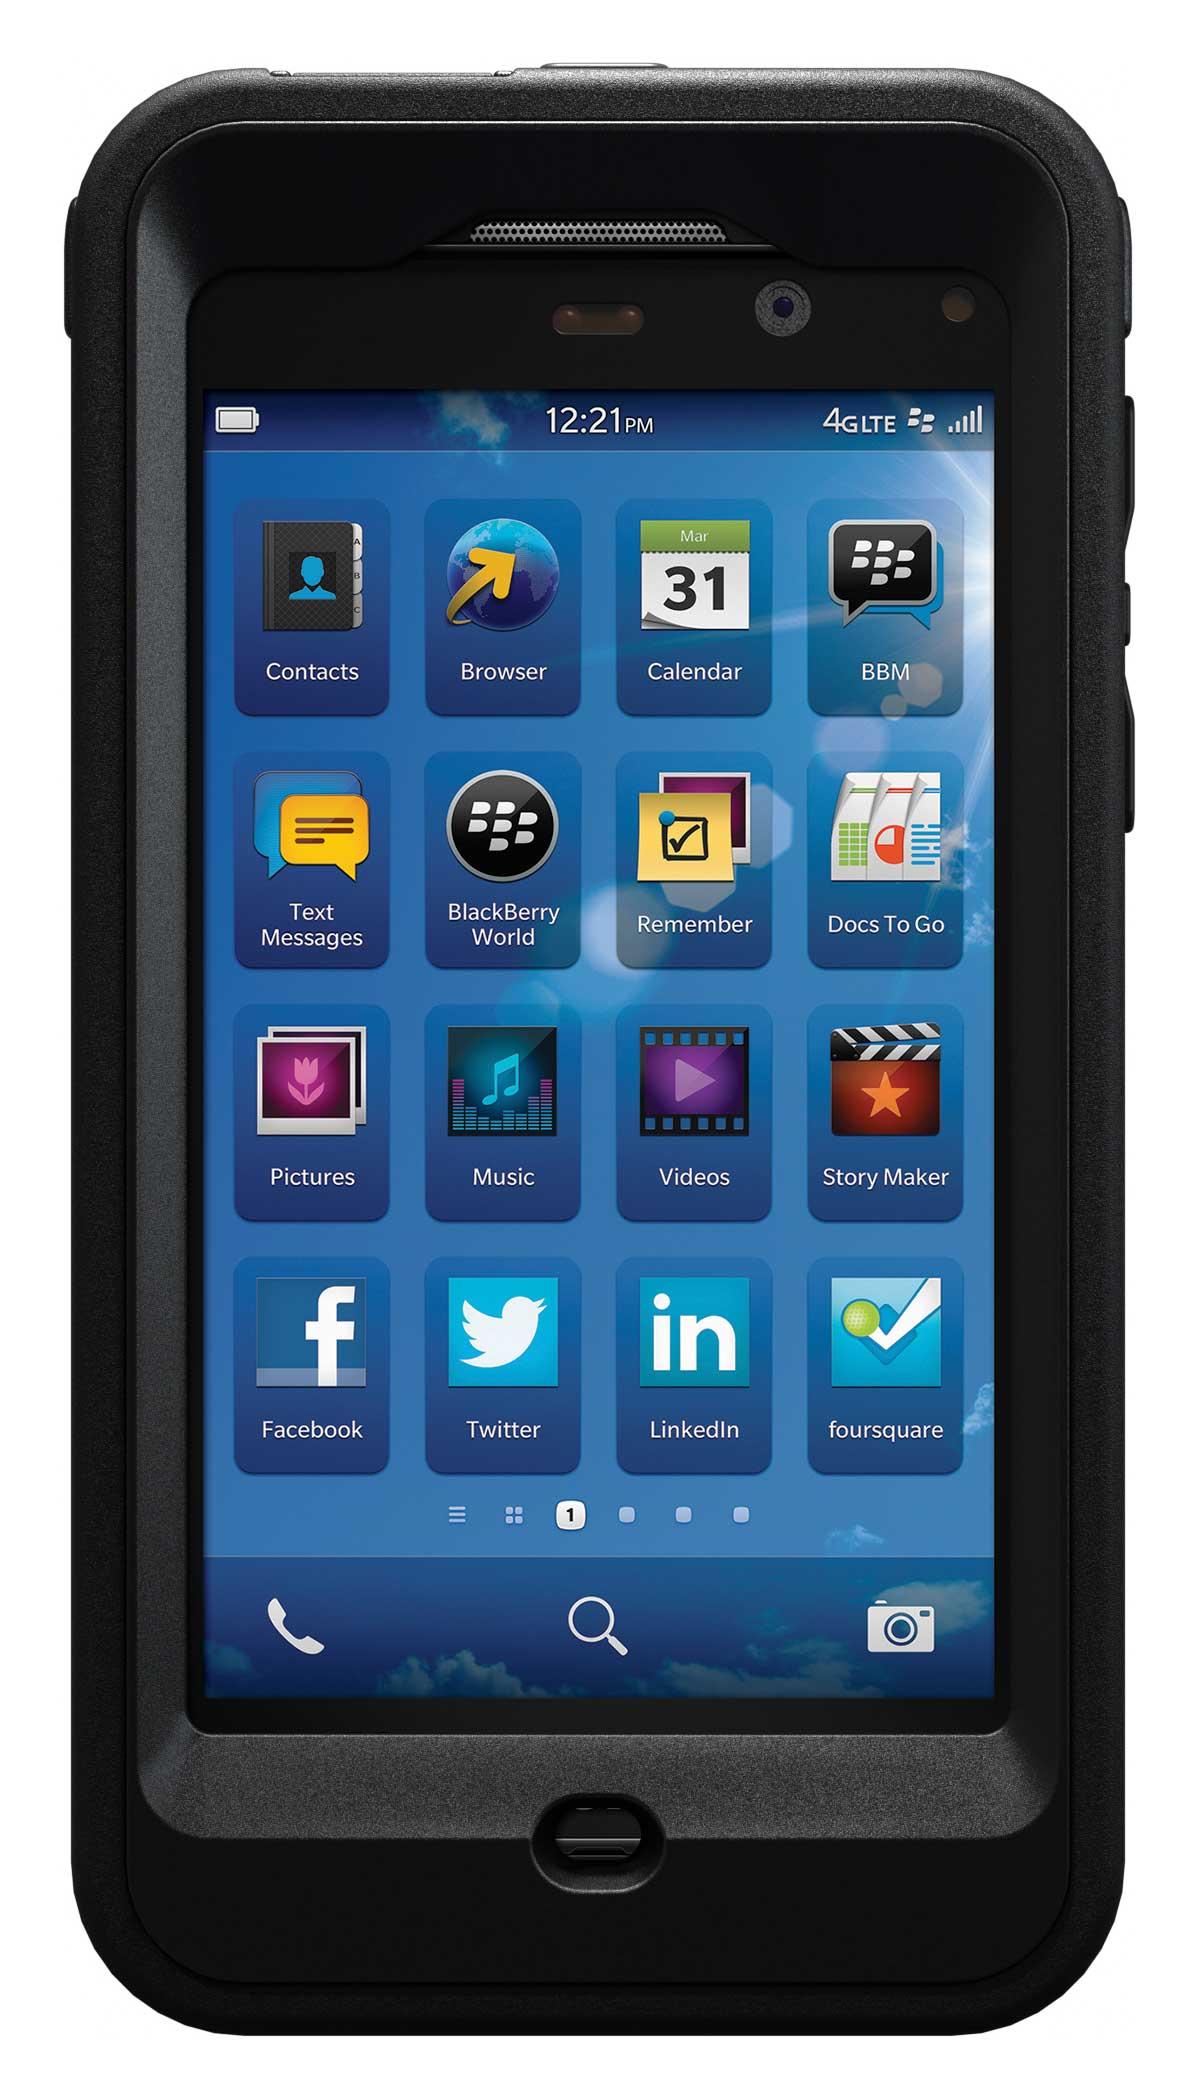 Otterbox Case For Blackberry Z10 Smartphone Q10 4g Lte